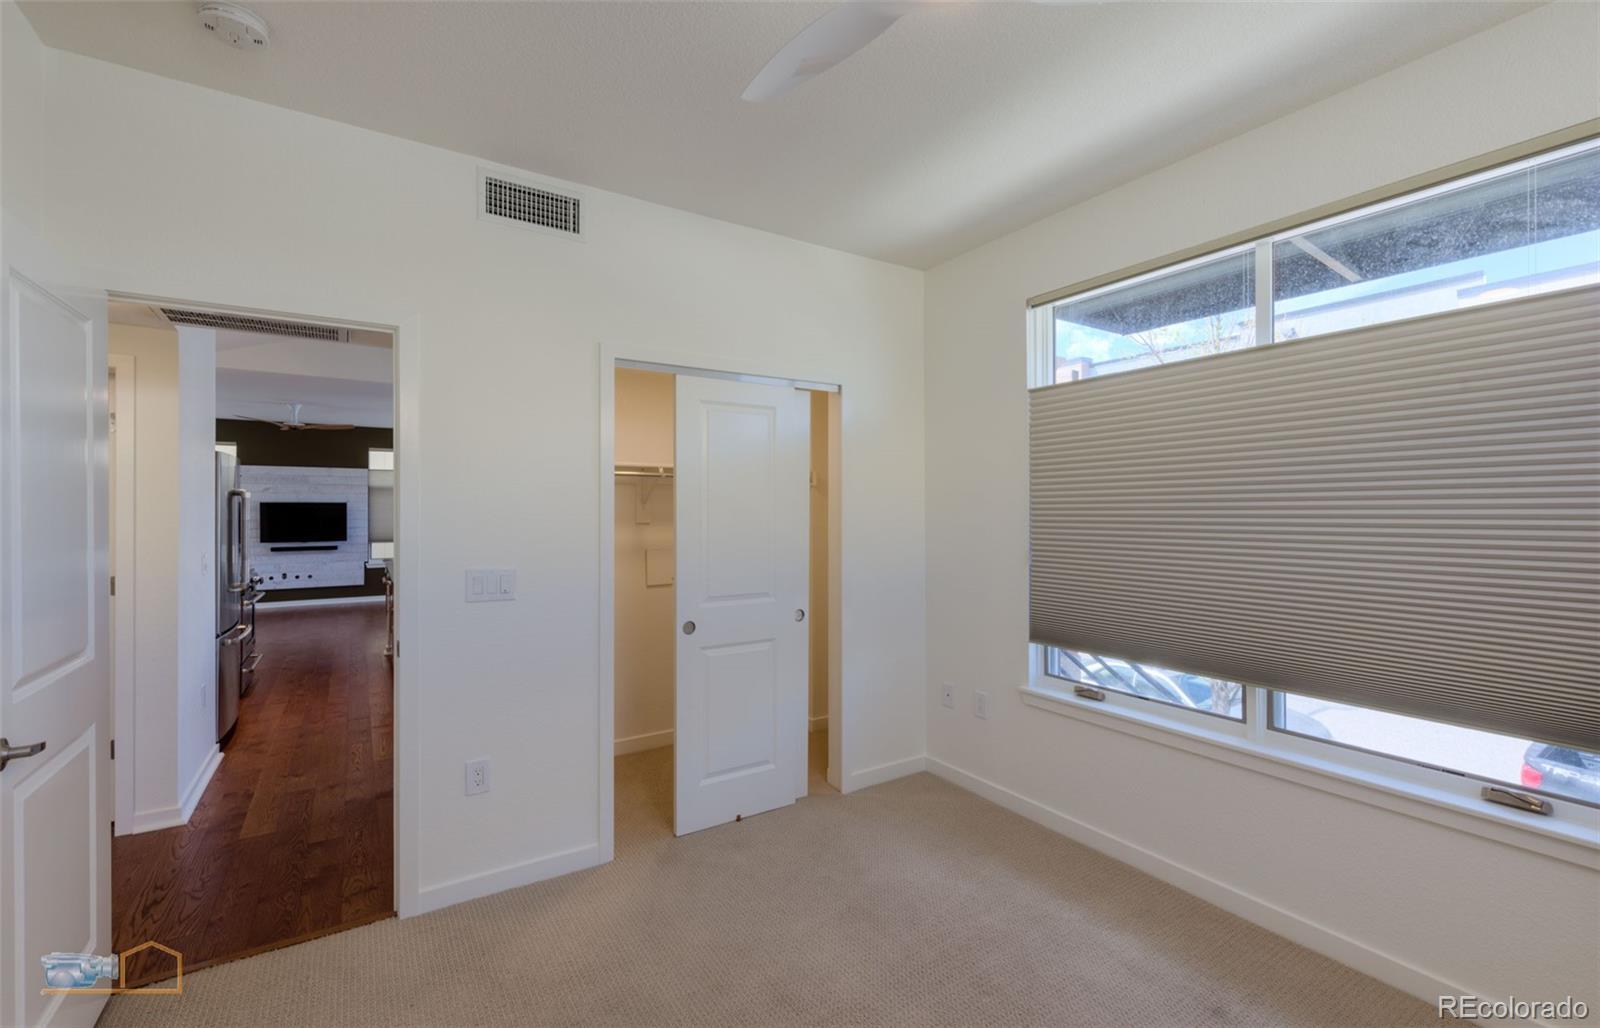 MLS# 8253378 - 15 - 1350 Rosewood Avenue, Boulder, CO 80304